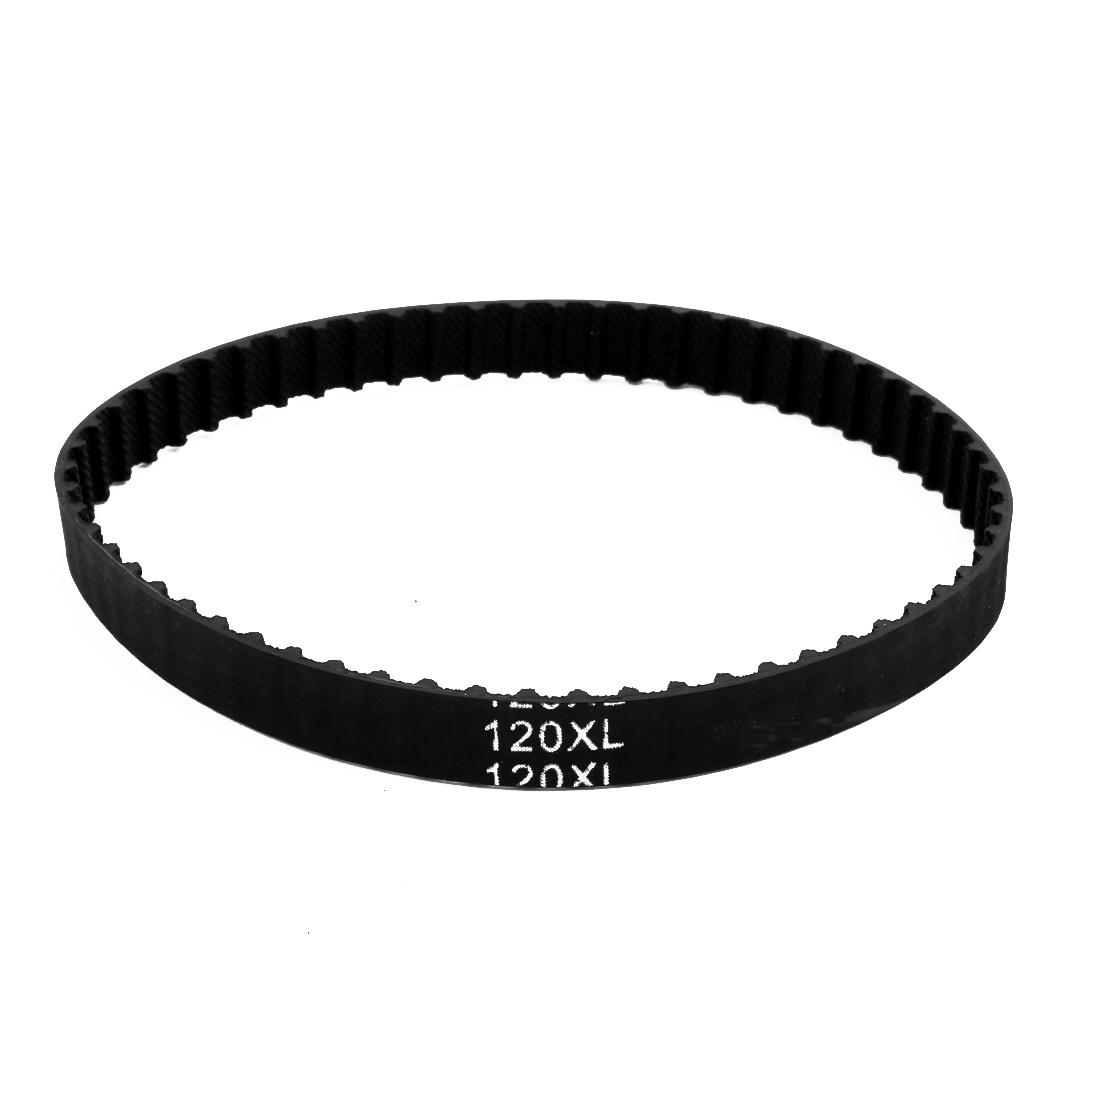 120XL 60 Teeth 10mm Width 5.08mm Pitch Stepper Motor Rubber Timing Geared Belt